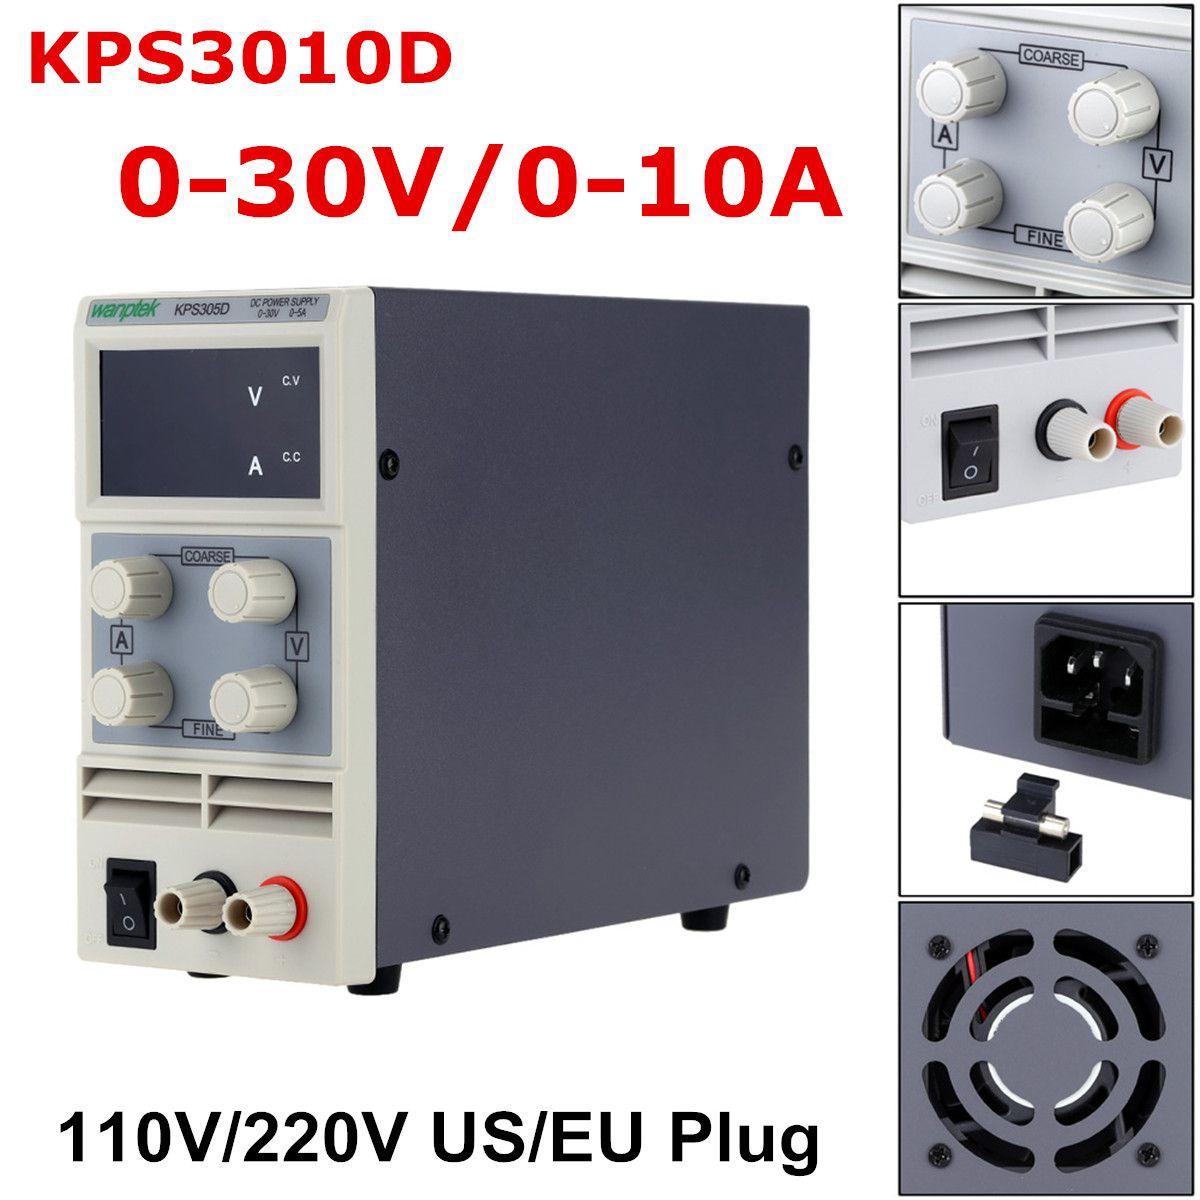 LED Voltage Regulator KPS3010D 110V/220V DC US/EU 0-30V 10A Switching Power Supply Precision Low Ripple/Noise Highly Efficient